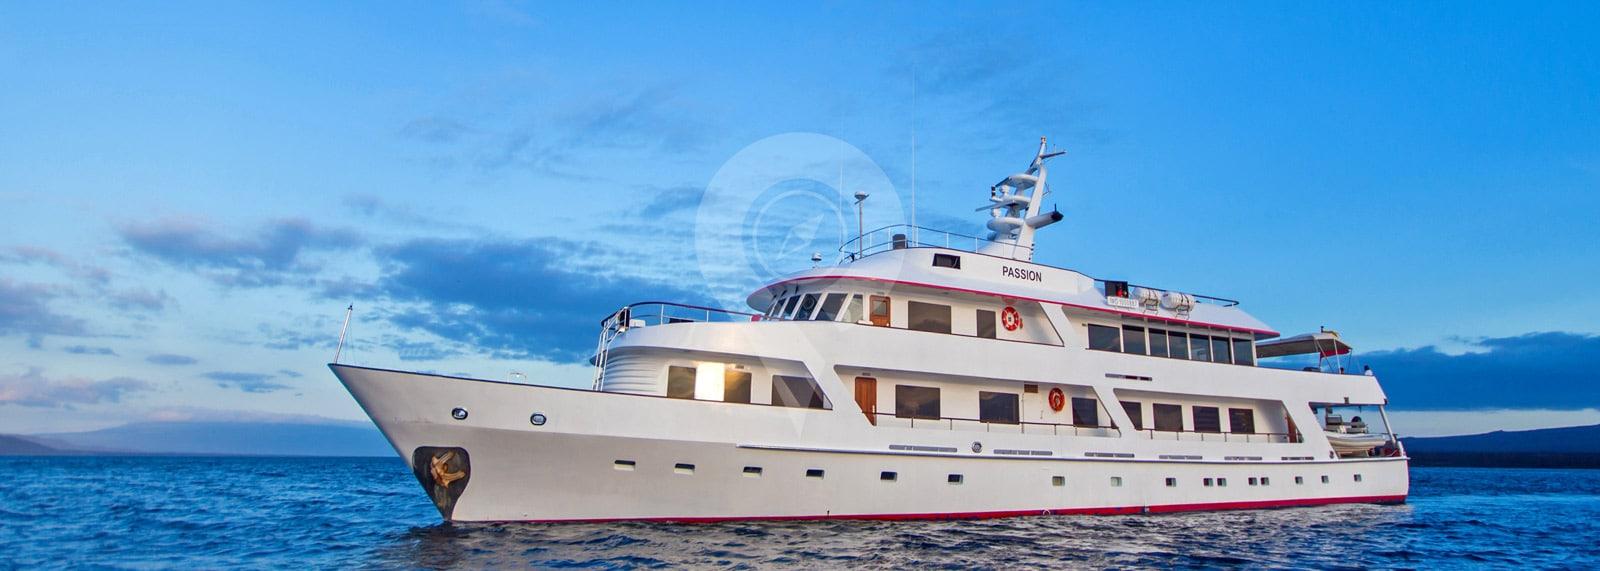 Passion Galapagos Yacht